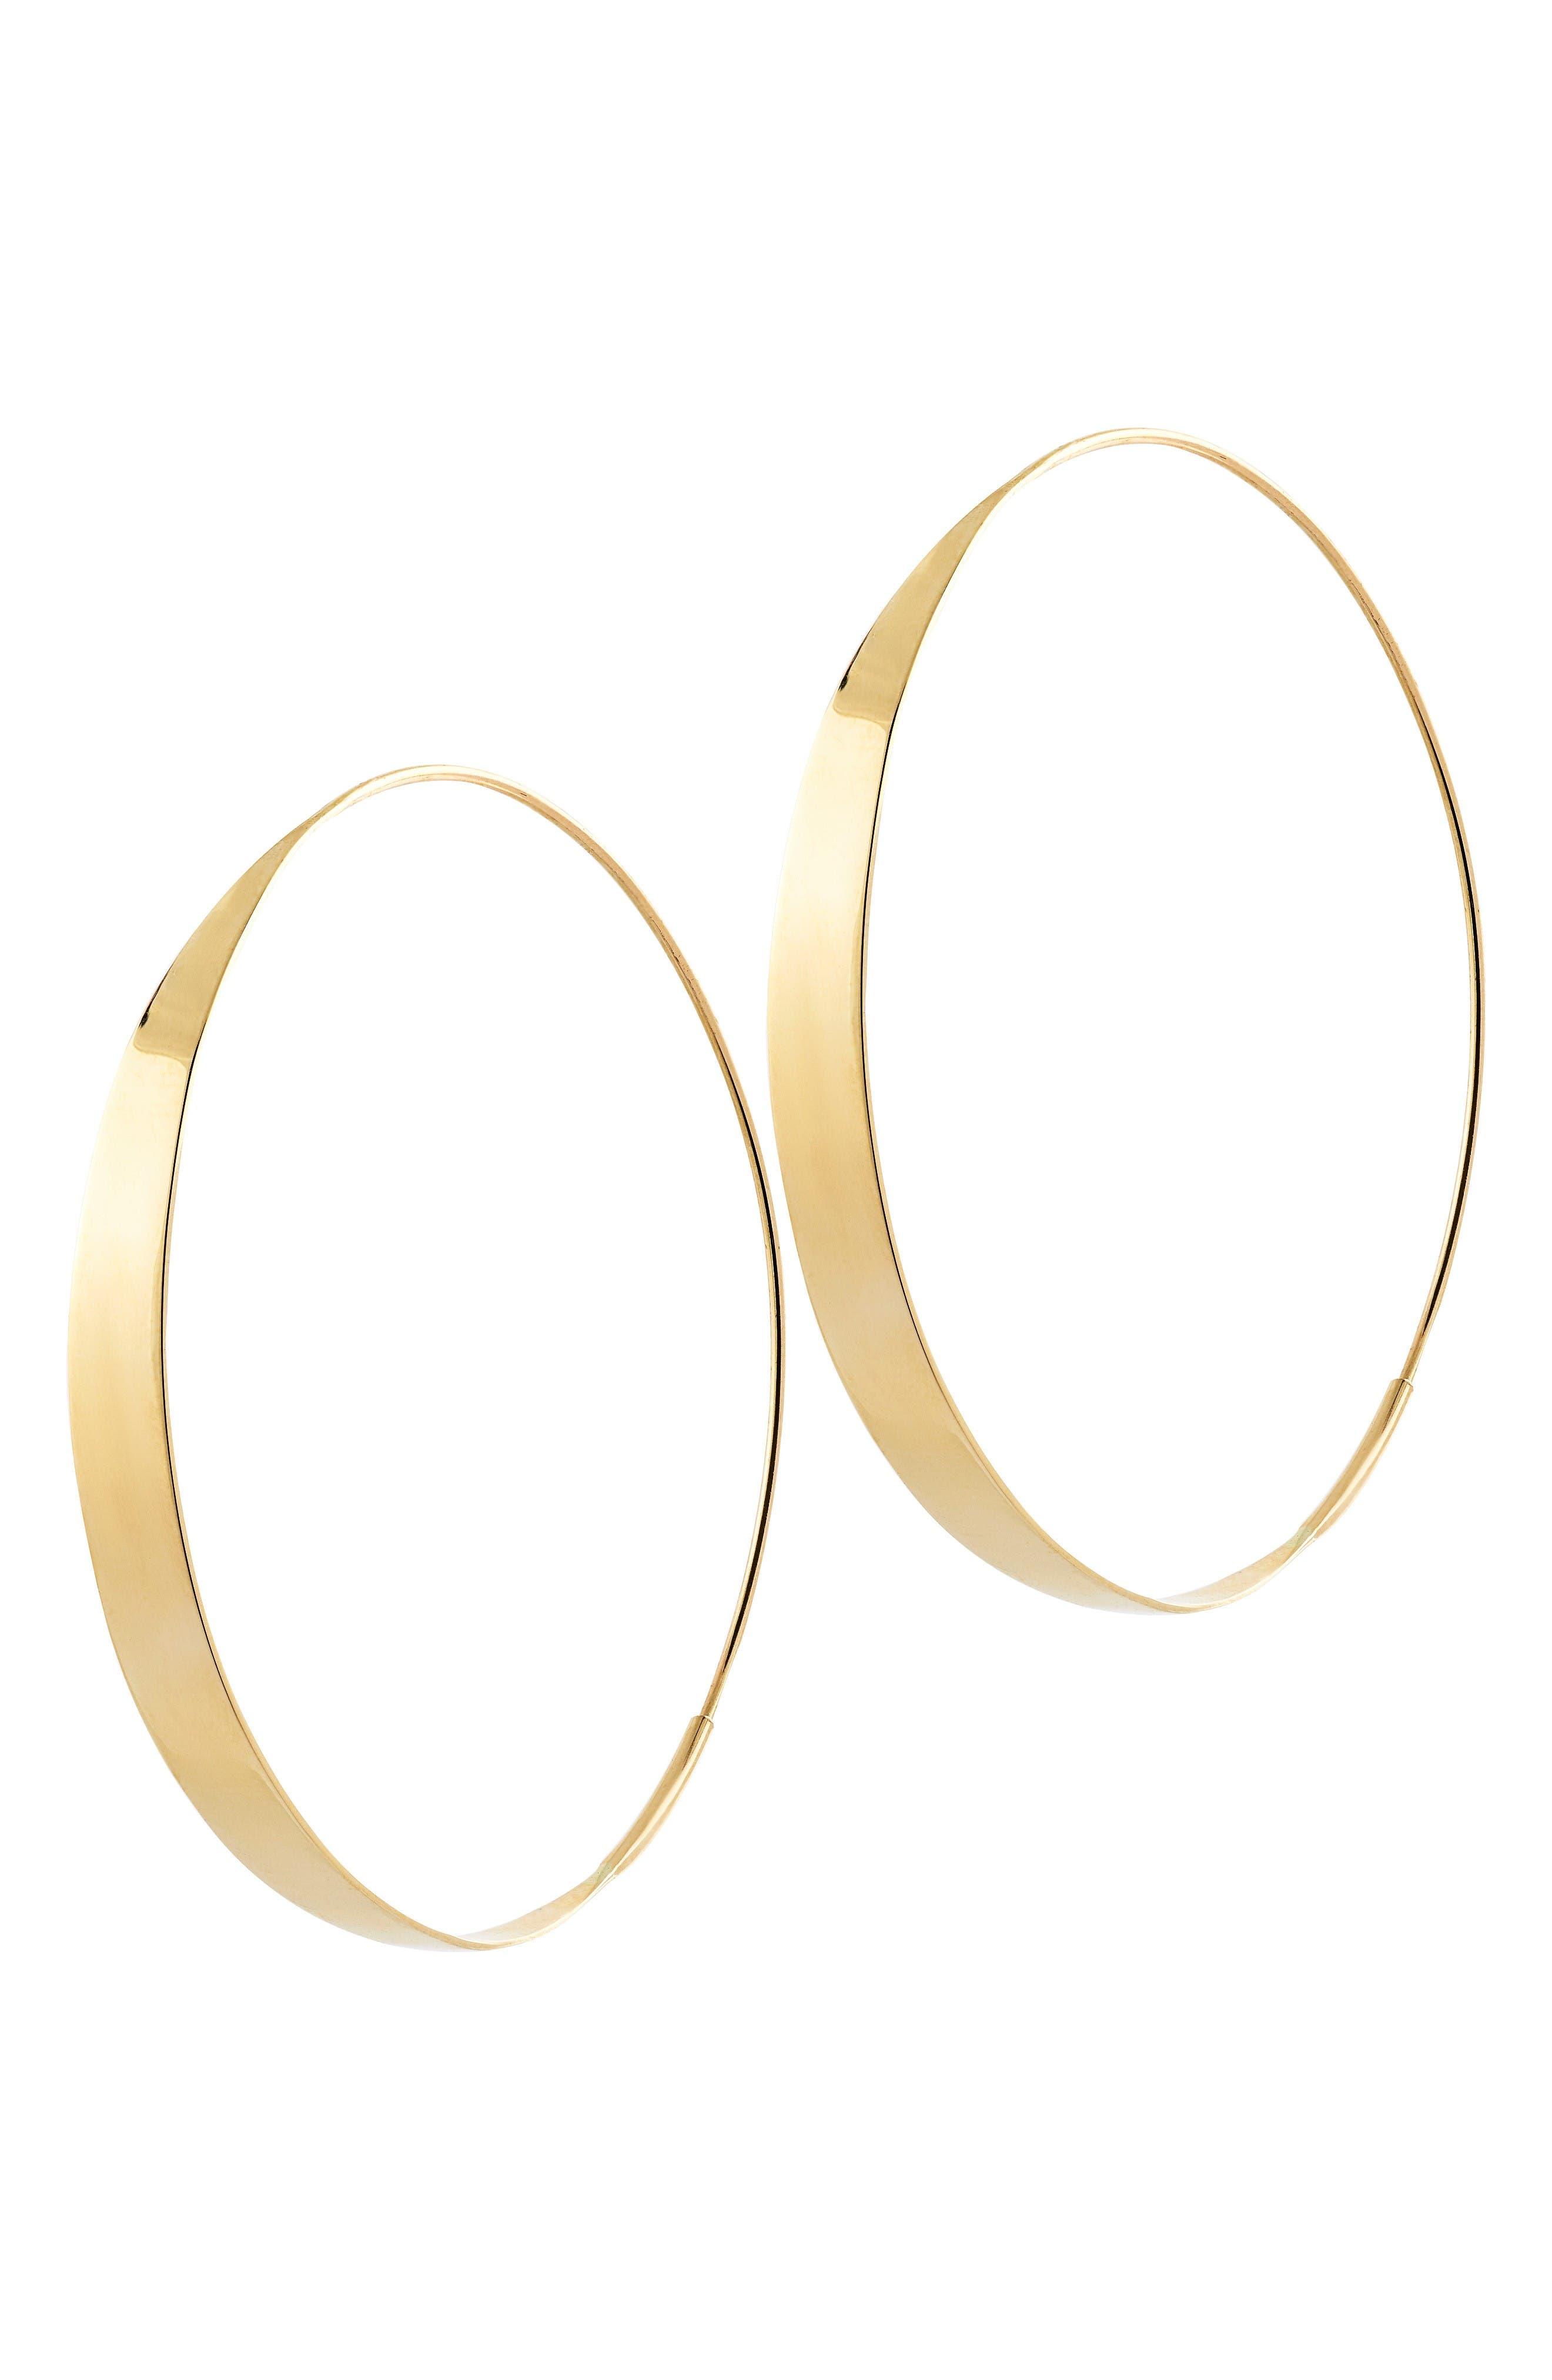 Main Image - Lana Jewelry Bond Endless Hoop Earrings